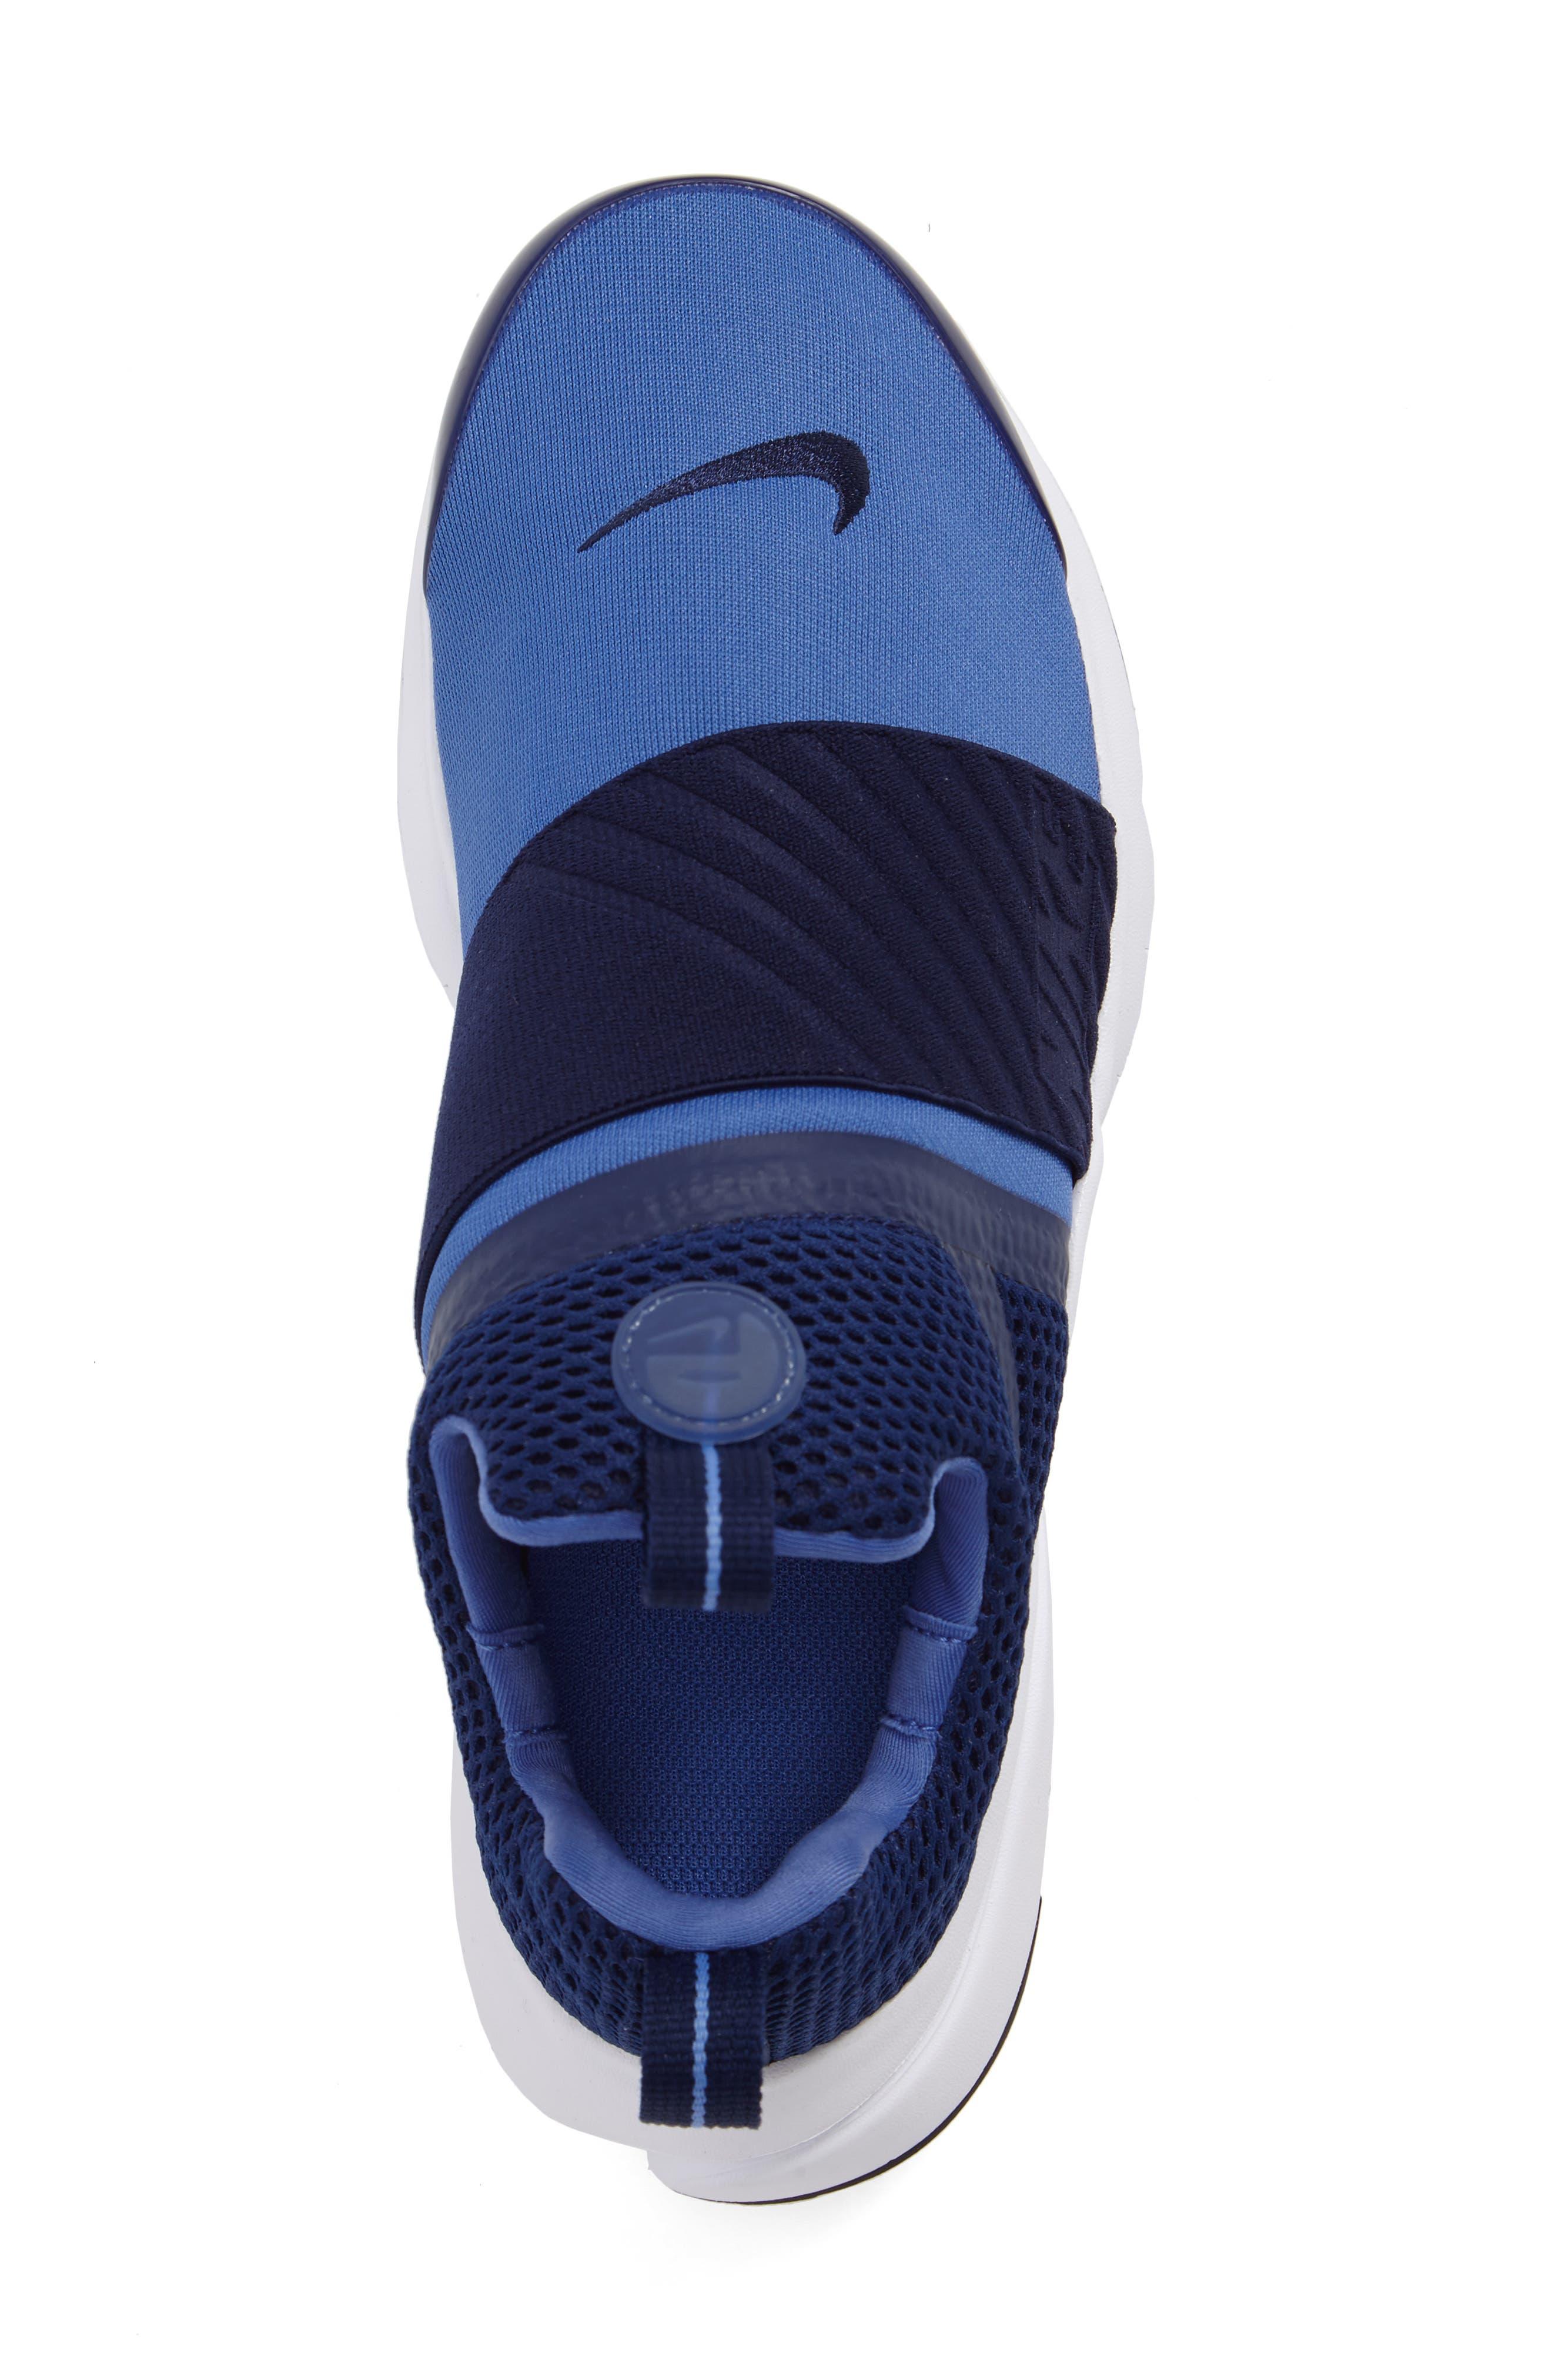 Presto Extreme Sneaker,                             Alternate thumbnail 52, color,